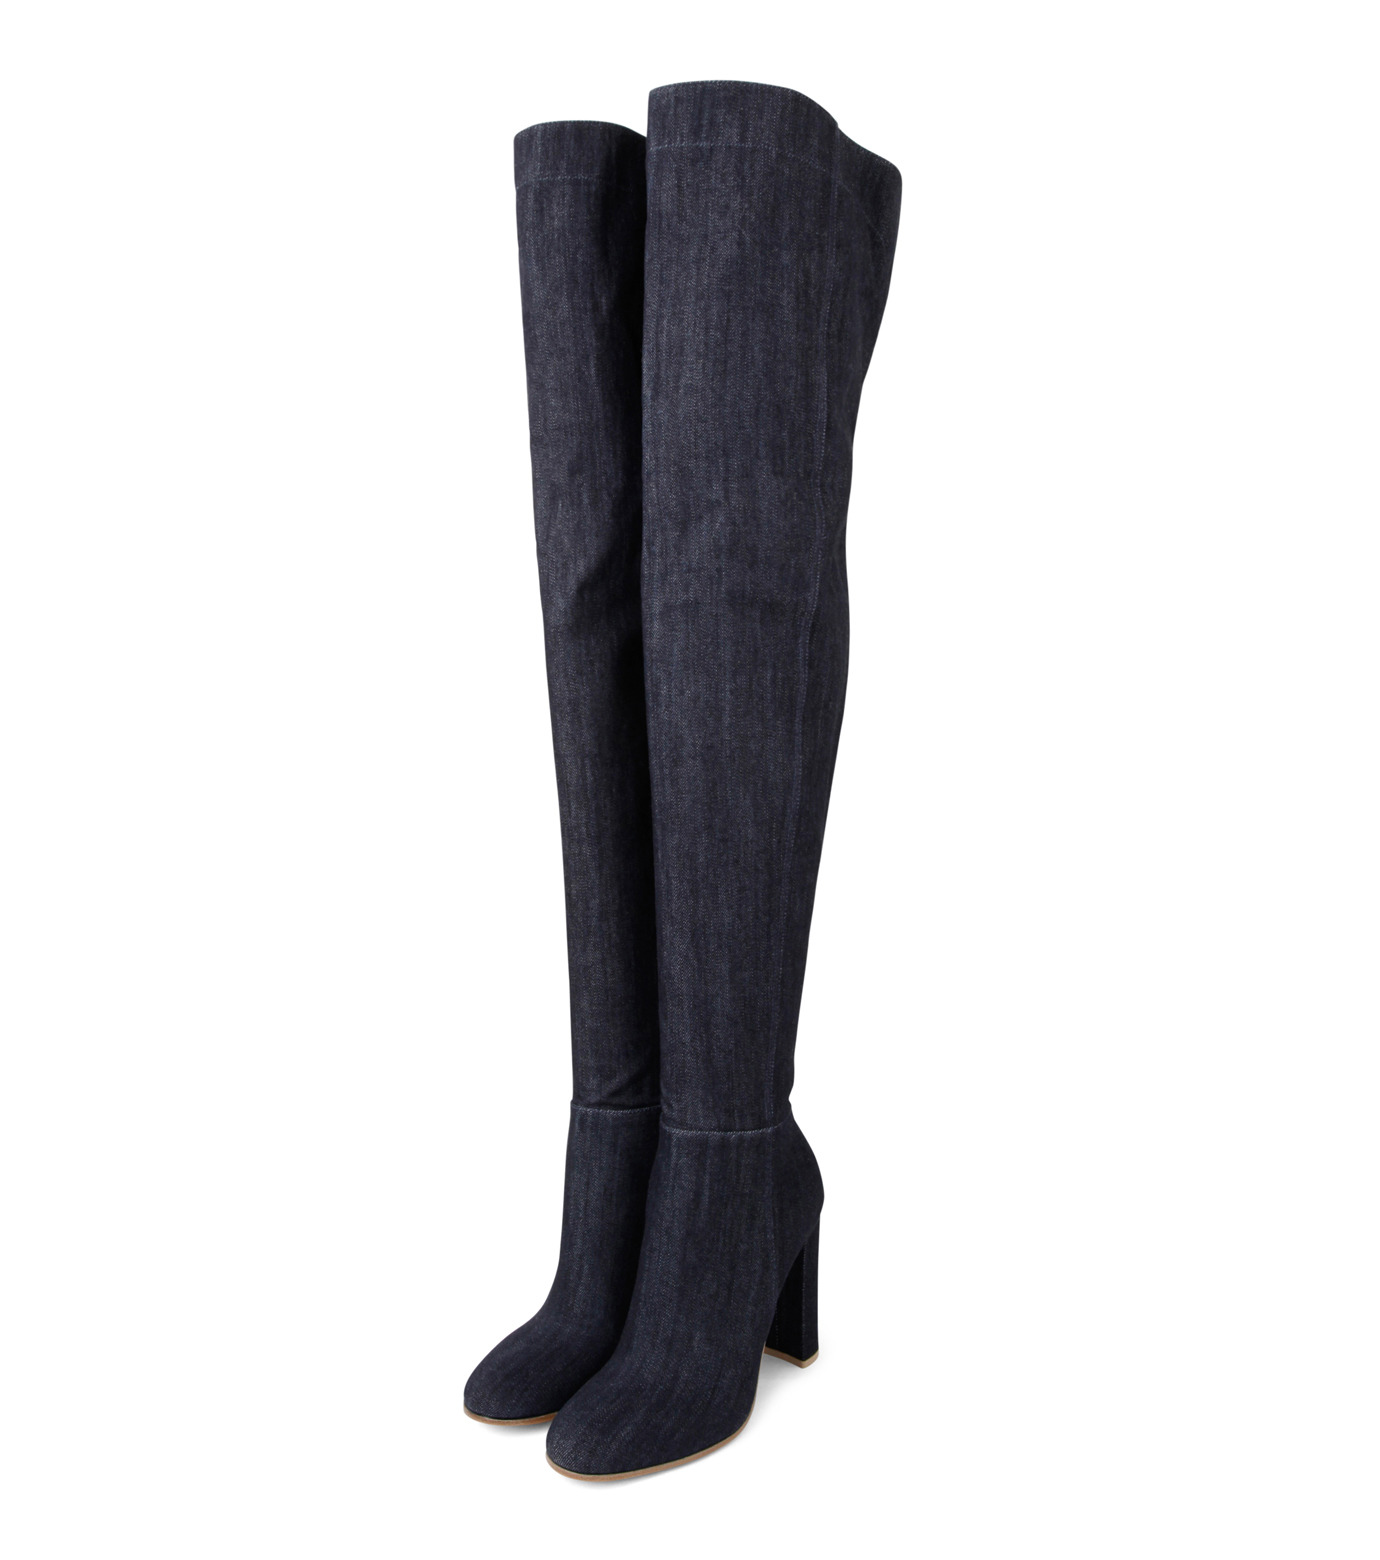 Gianvito Rossi(ジャンヴィト ロッシ)のDenim Over the Knee Boots-INDIGO(ブーツ/boots)-G80806-94 拡大詳細画像3